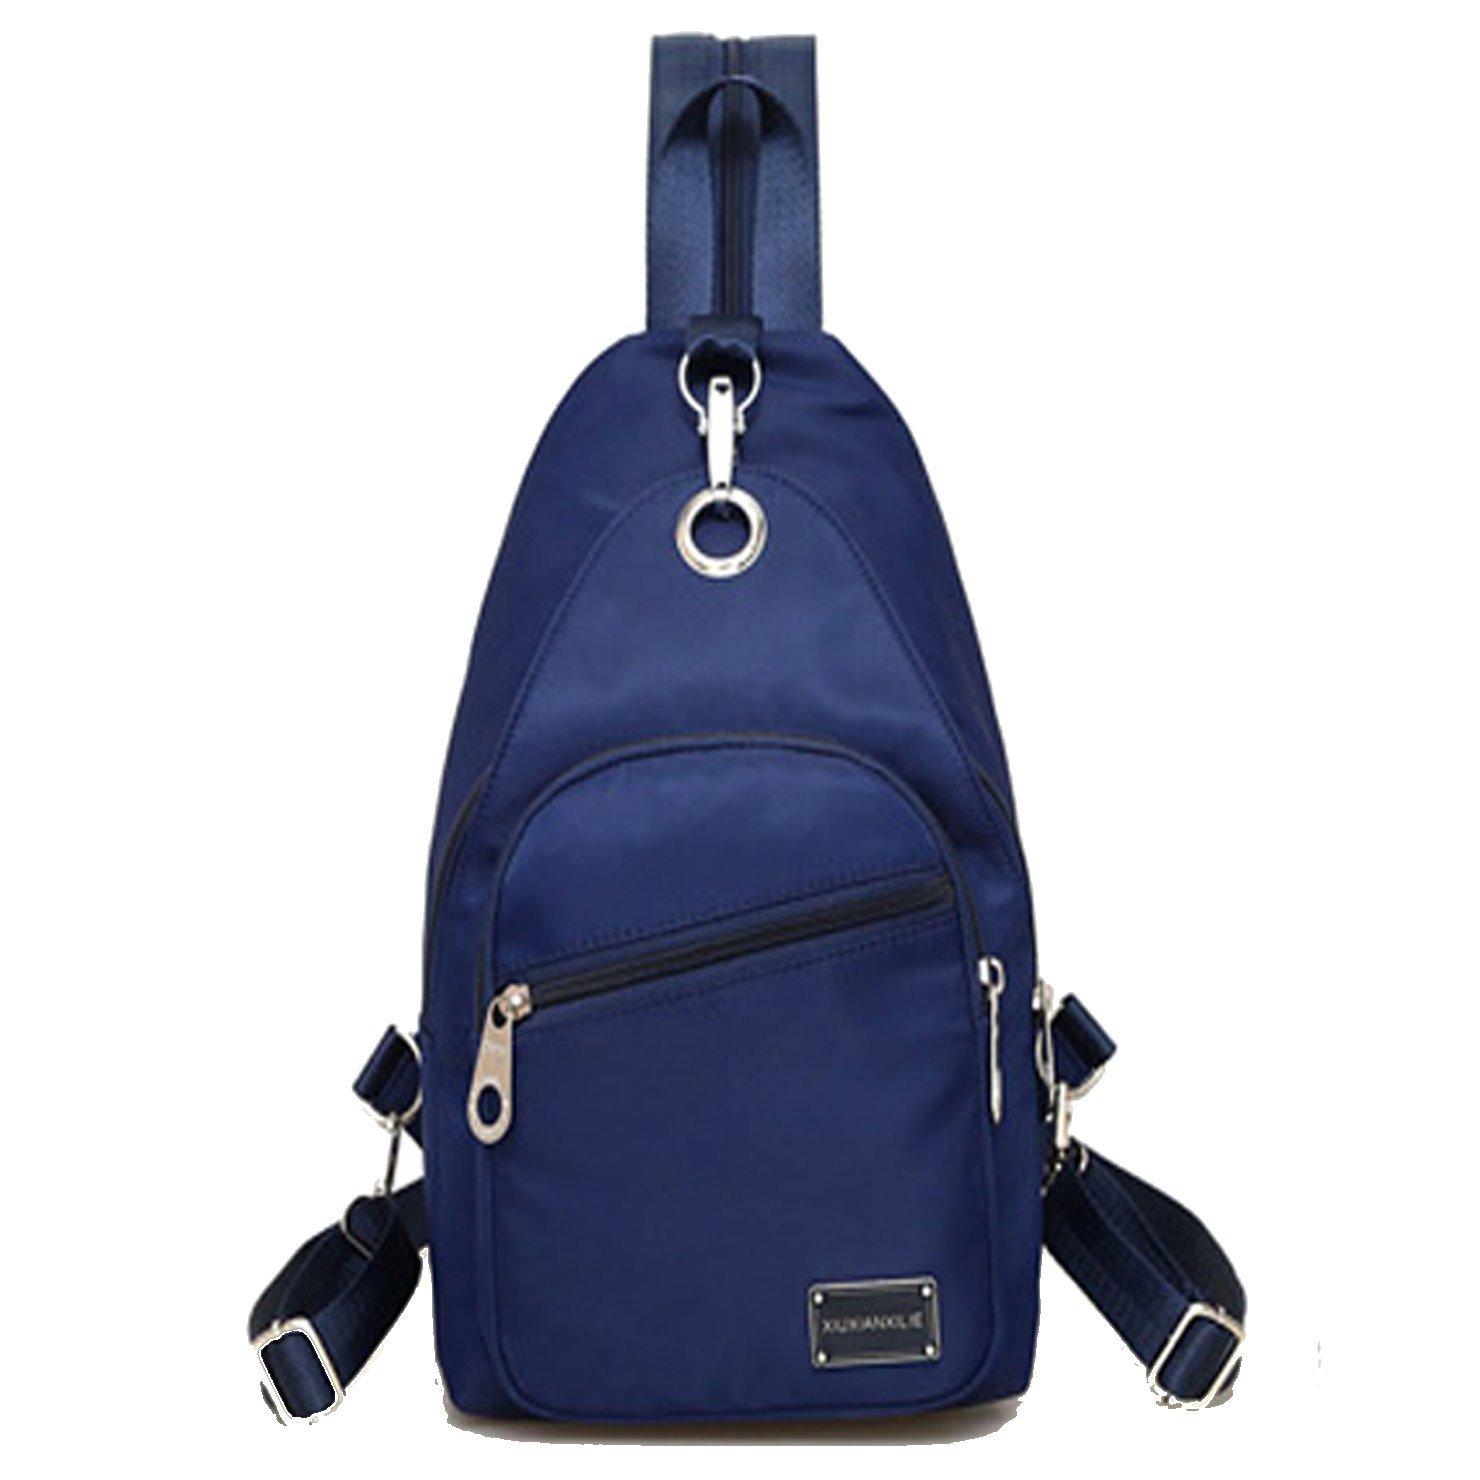 f0db102547f3 Amazon.com  Lustear Sling Bag For Men   Women Crossbody Backpack (Navy  Blue)  Shoes